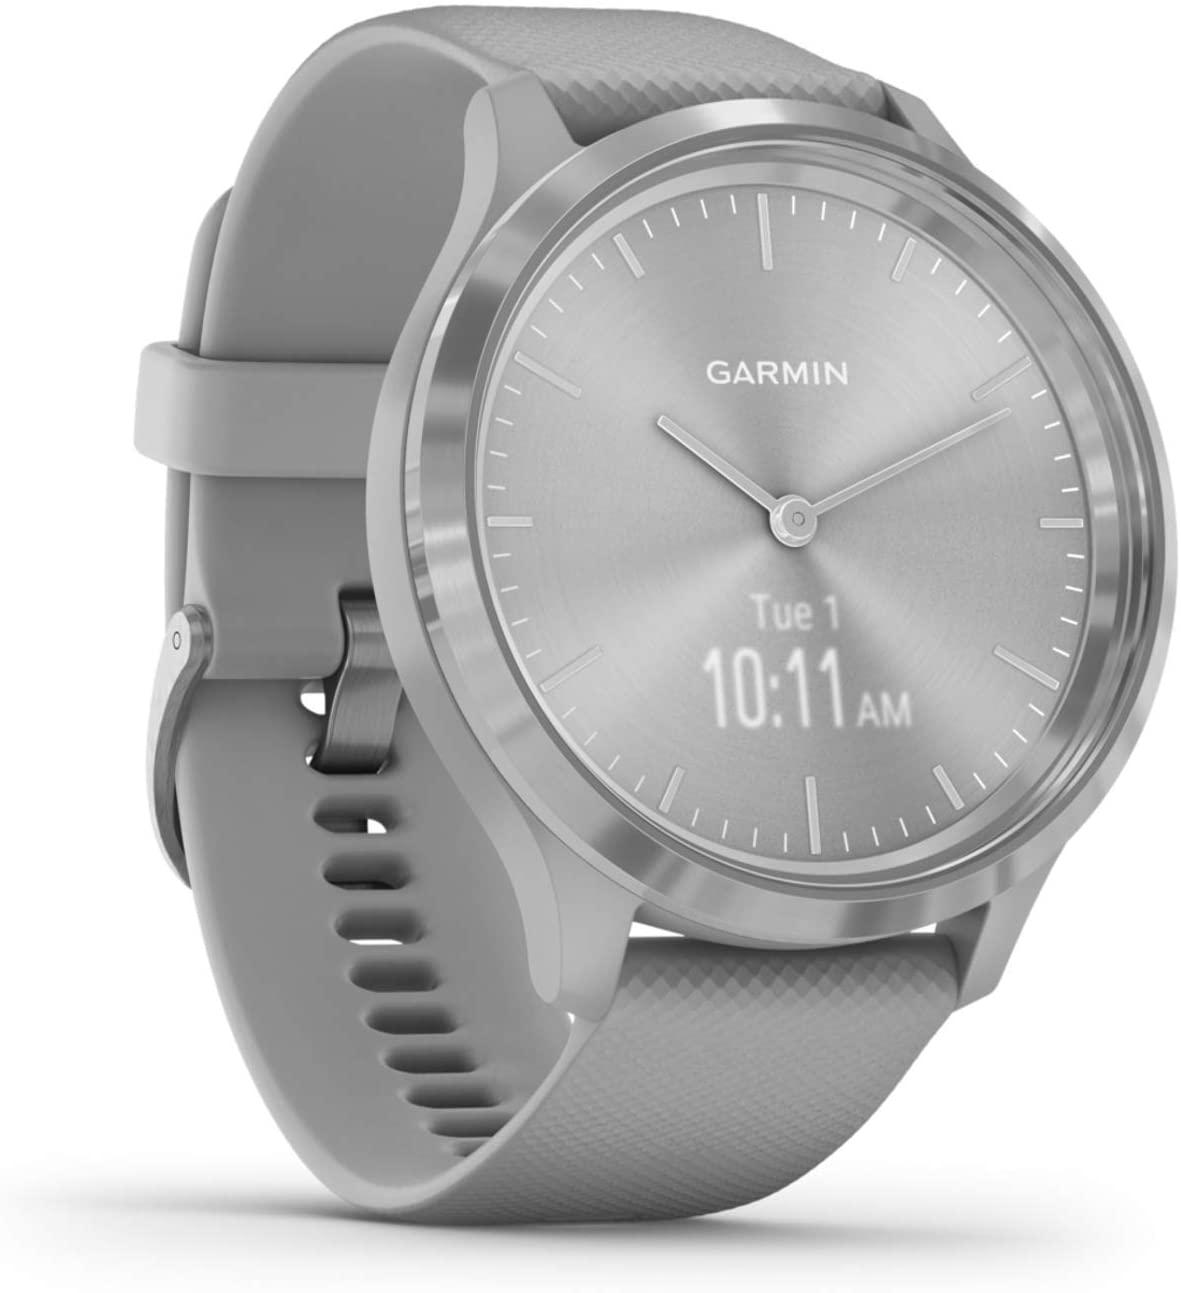 Prime Day 2021, Garmin sconta decine di smartwatch